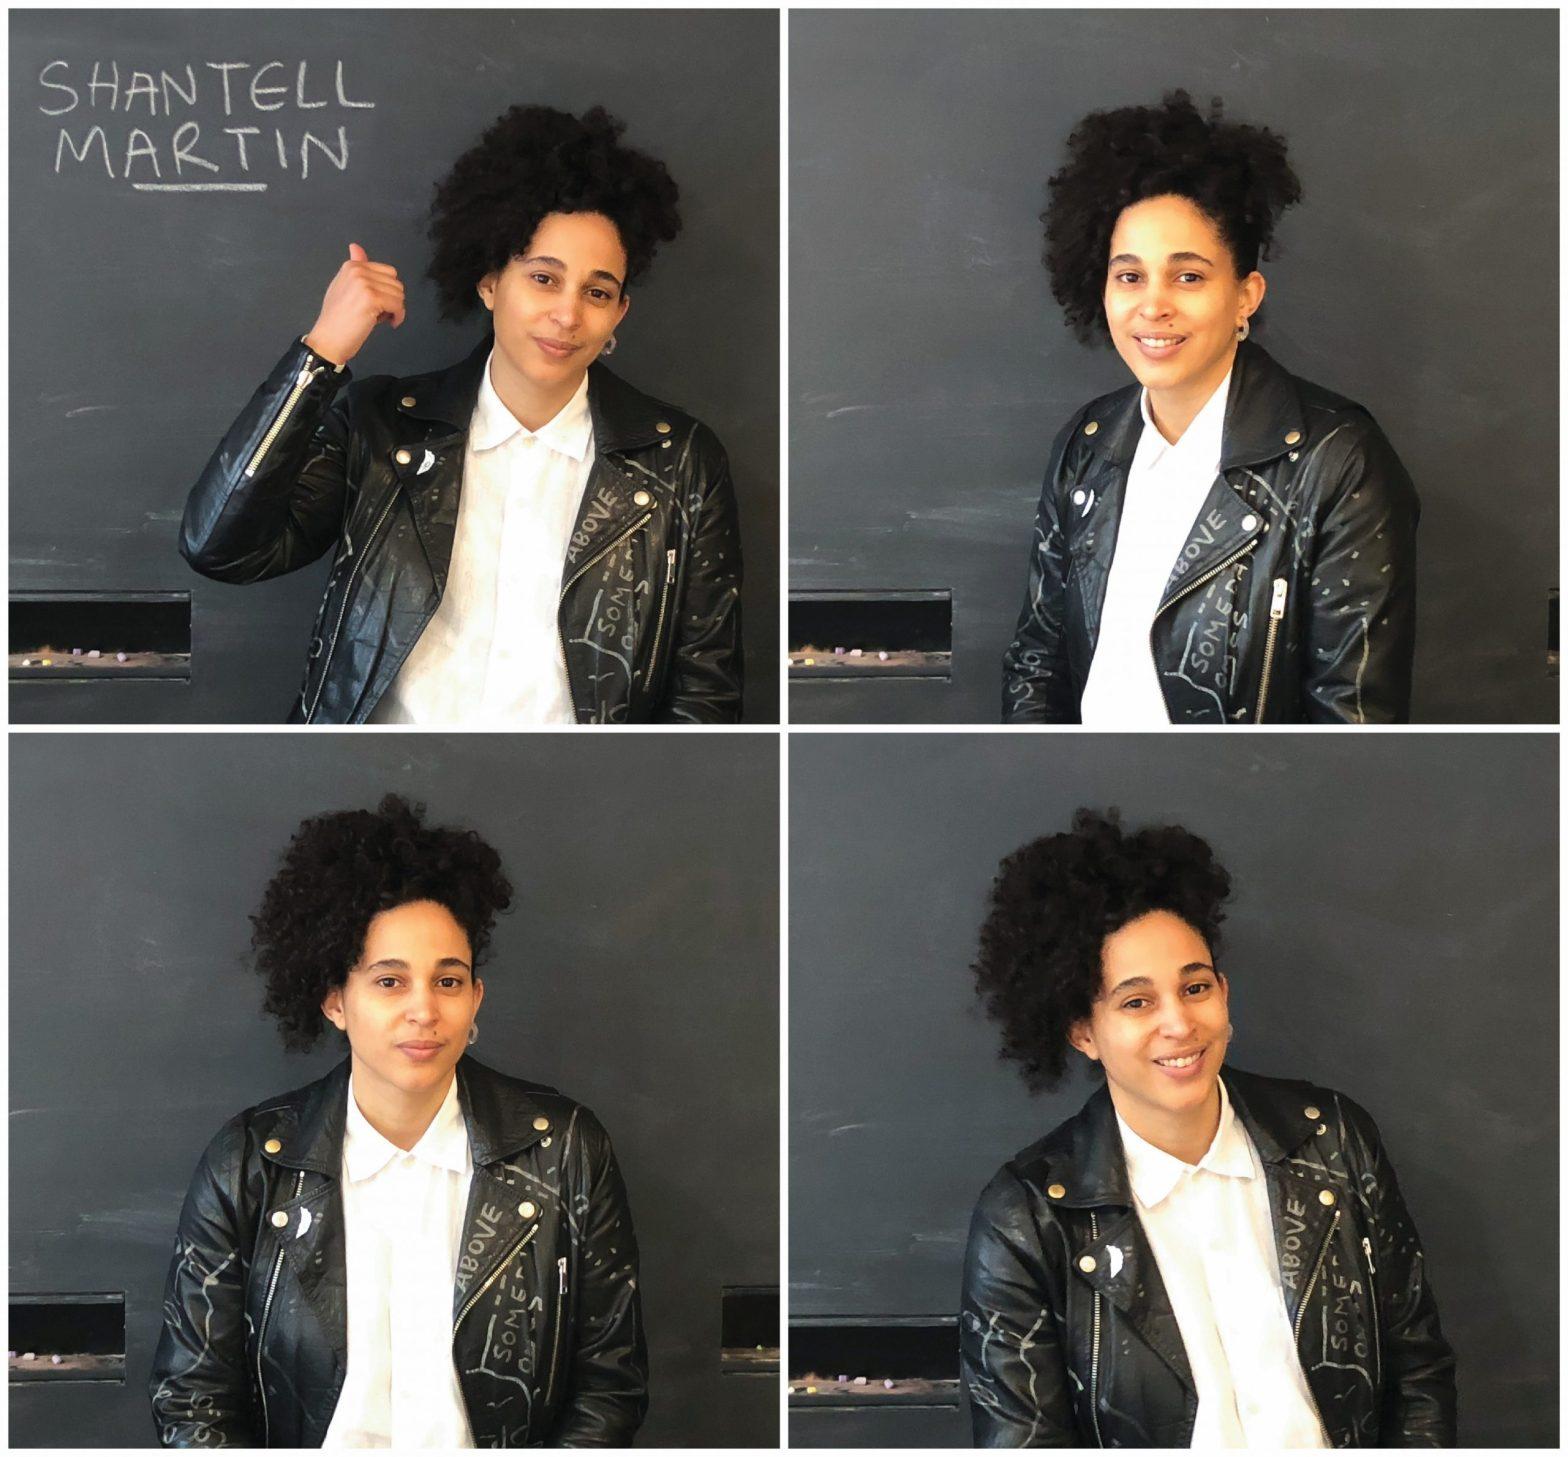 Thumbnail for Shantell Martin